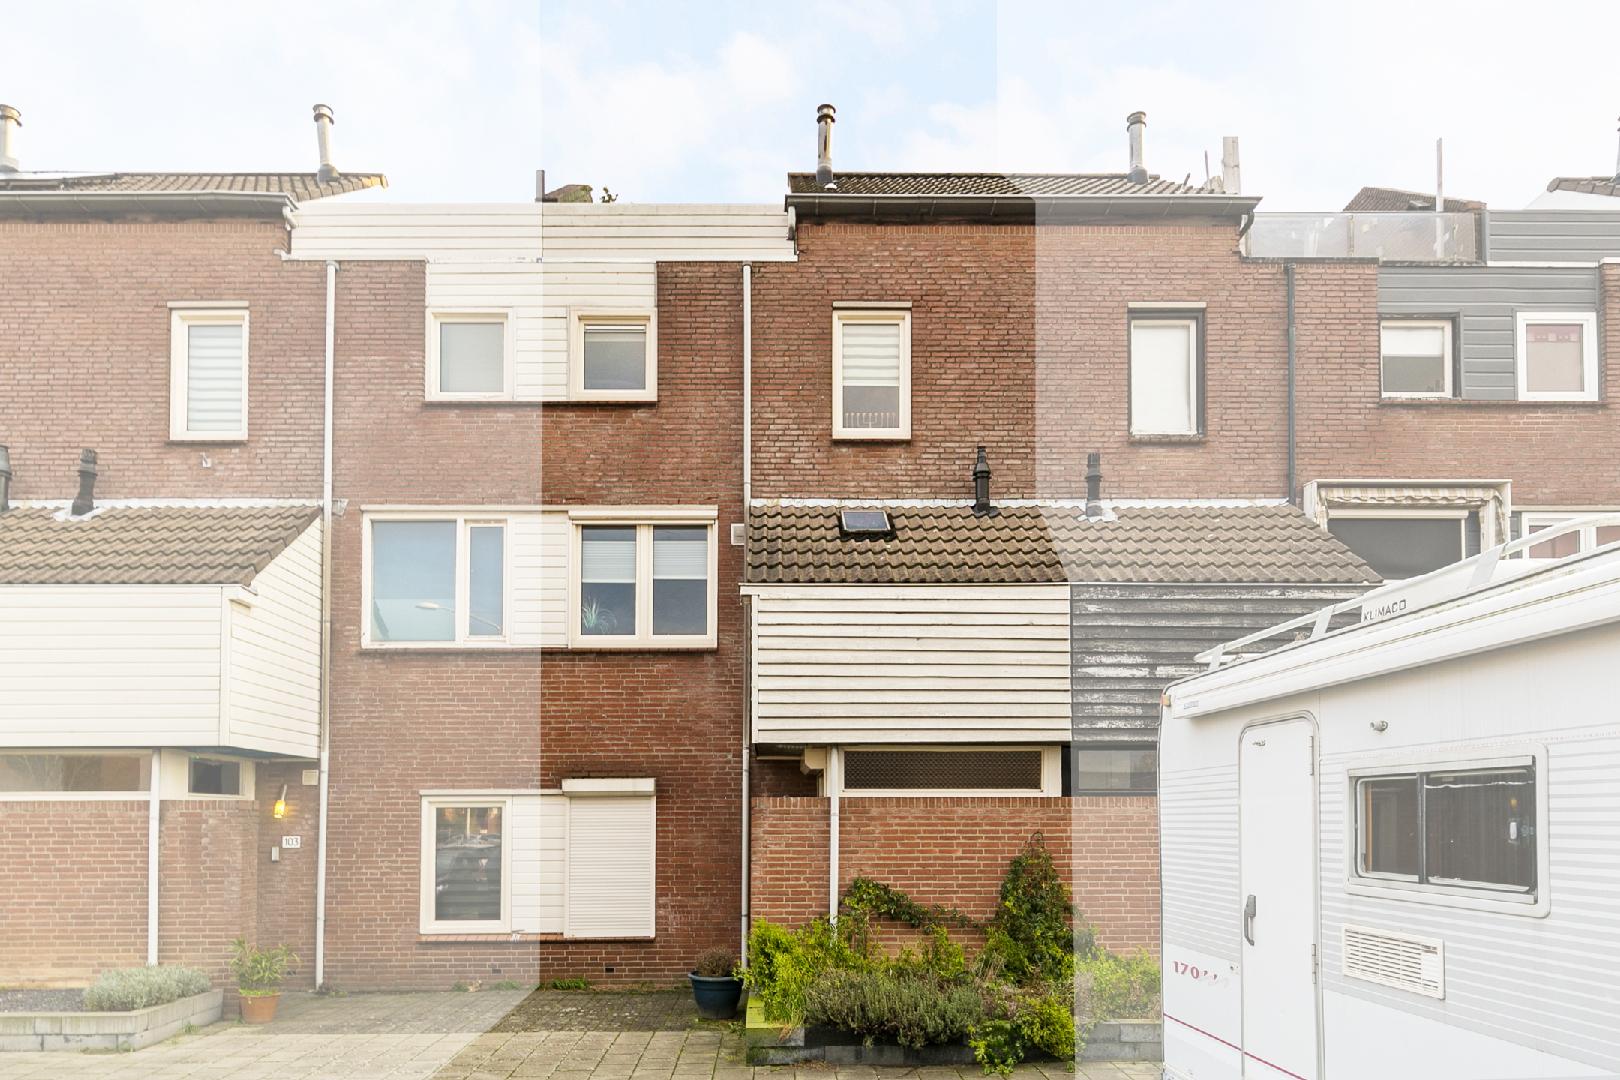 rompert park 101, 's-Hertogenbosch